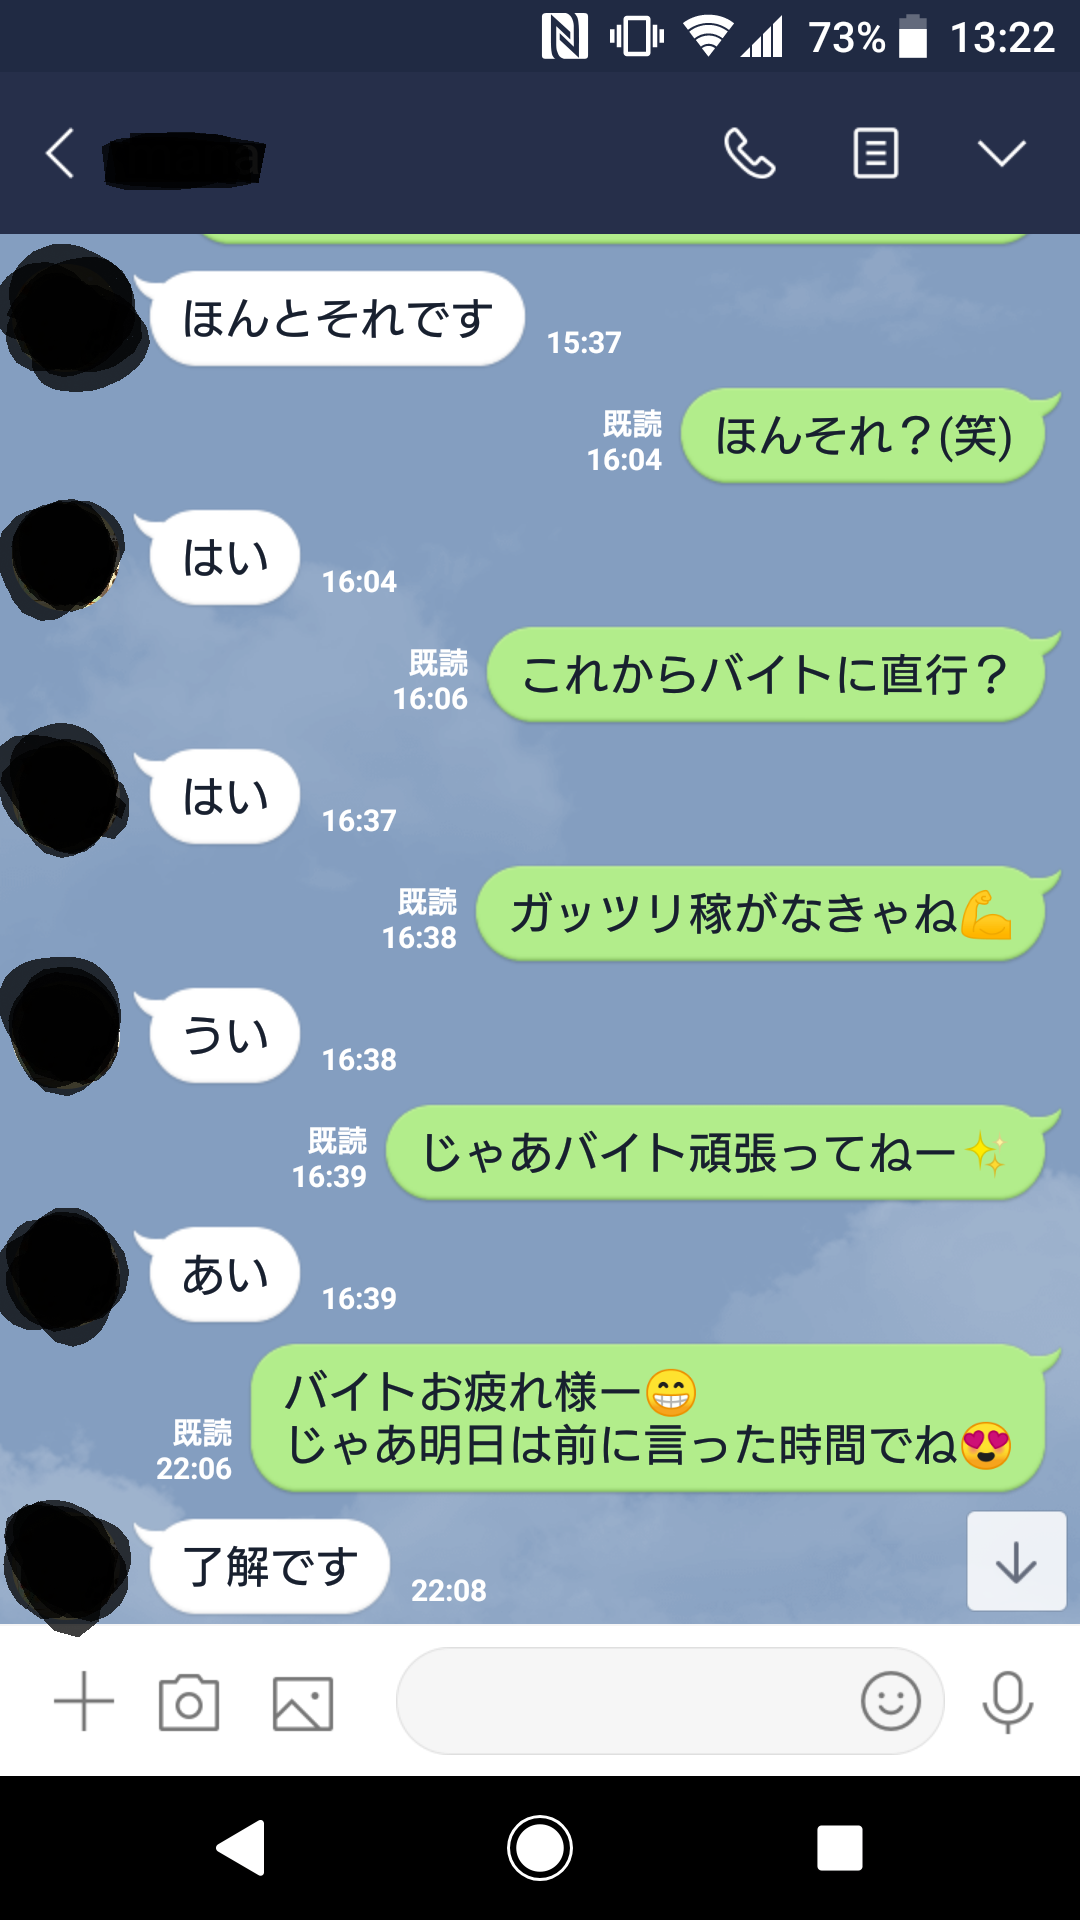 yuipo